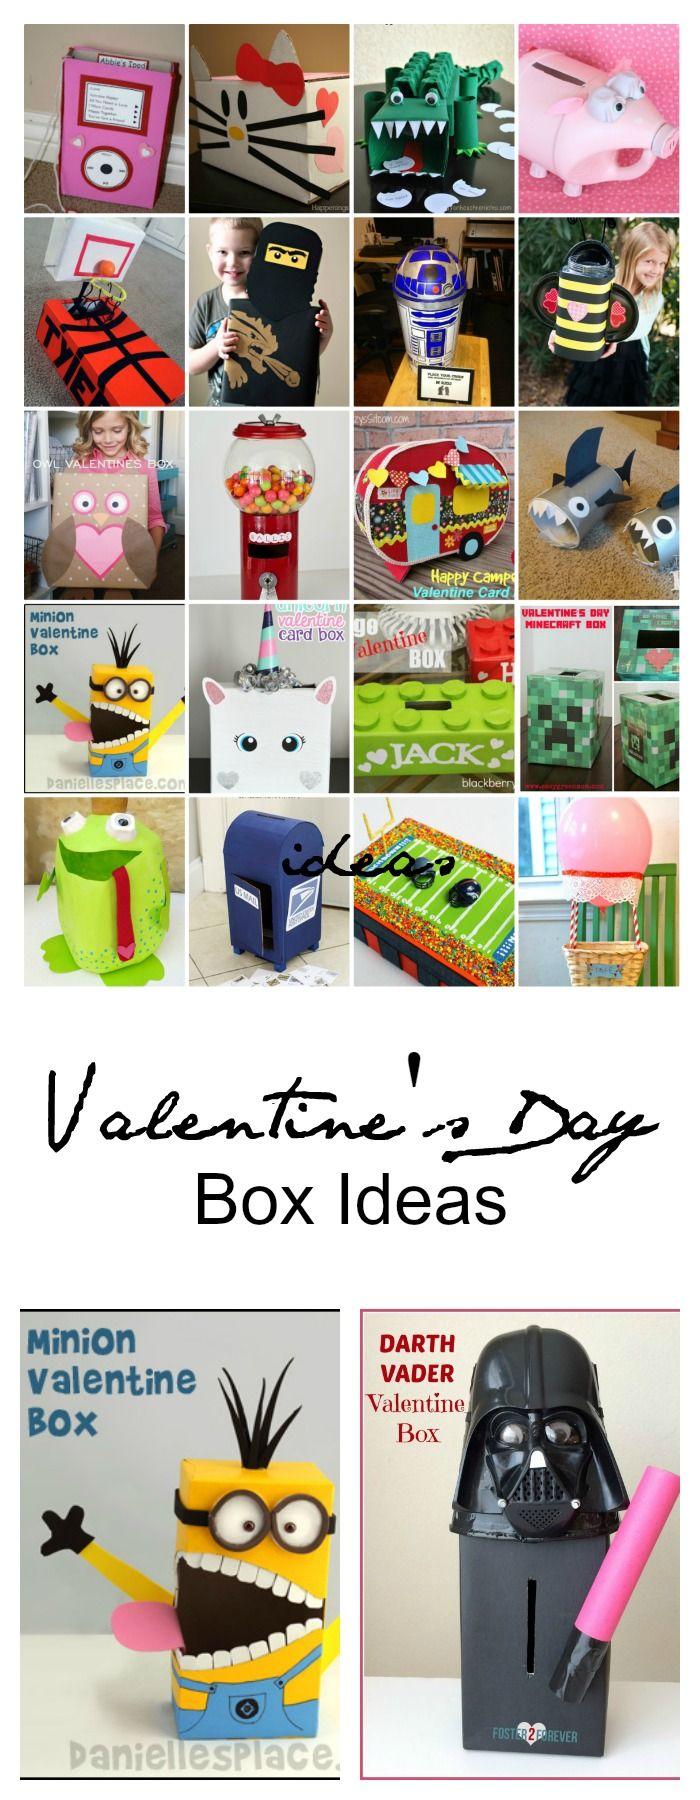 Valentine's Day Classroom Box Ideas - The Idea Room: